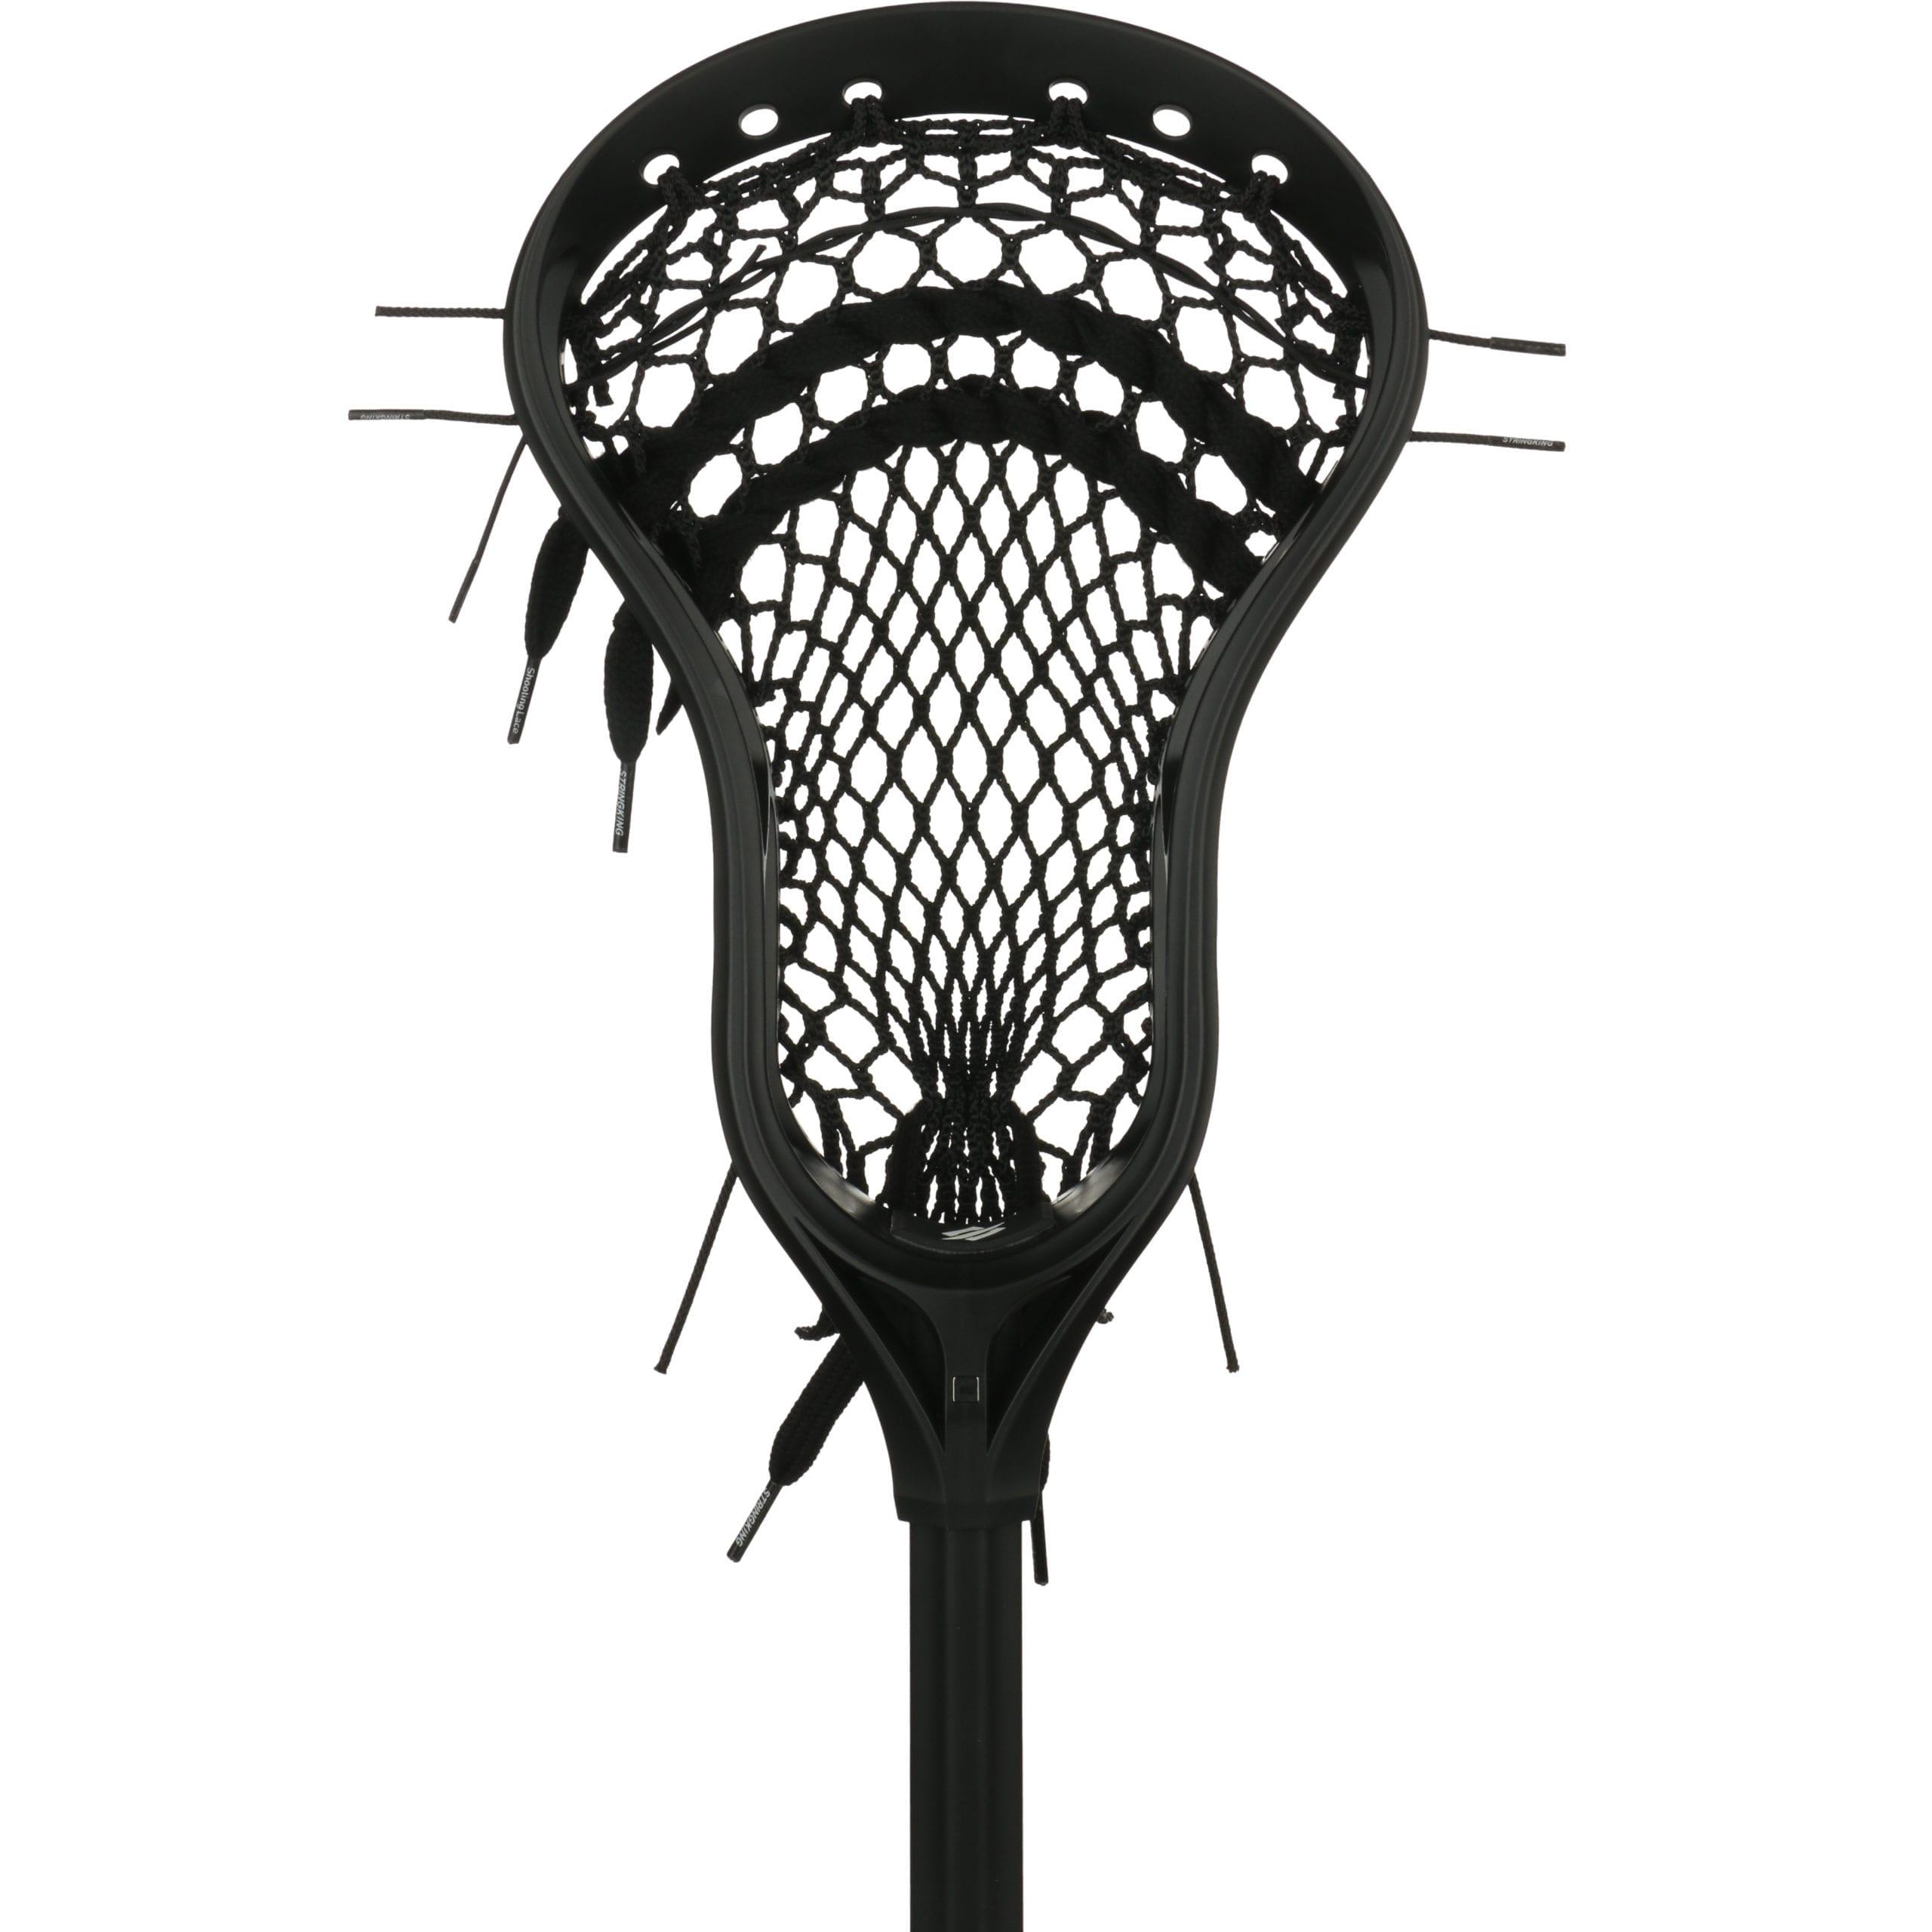 StringKing-Complete-2-INT-Lacrosse-Stick-Black-Black-Face_4000-scaled-1.jpg